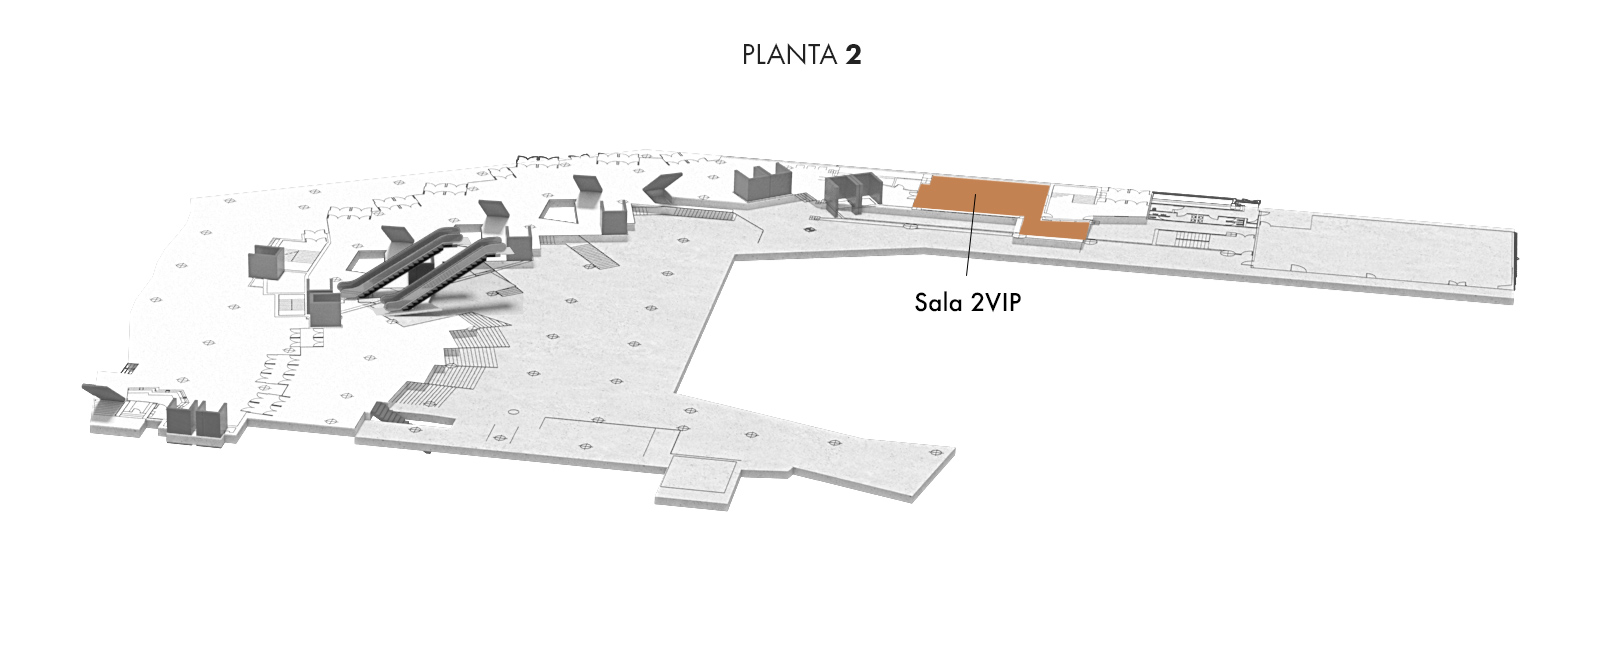 Sala 2VIP, Planta 2   Palacio Euskalduna Jauregia